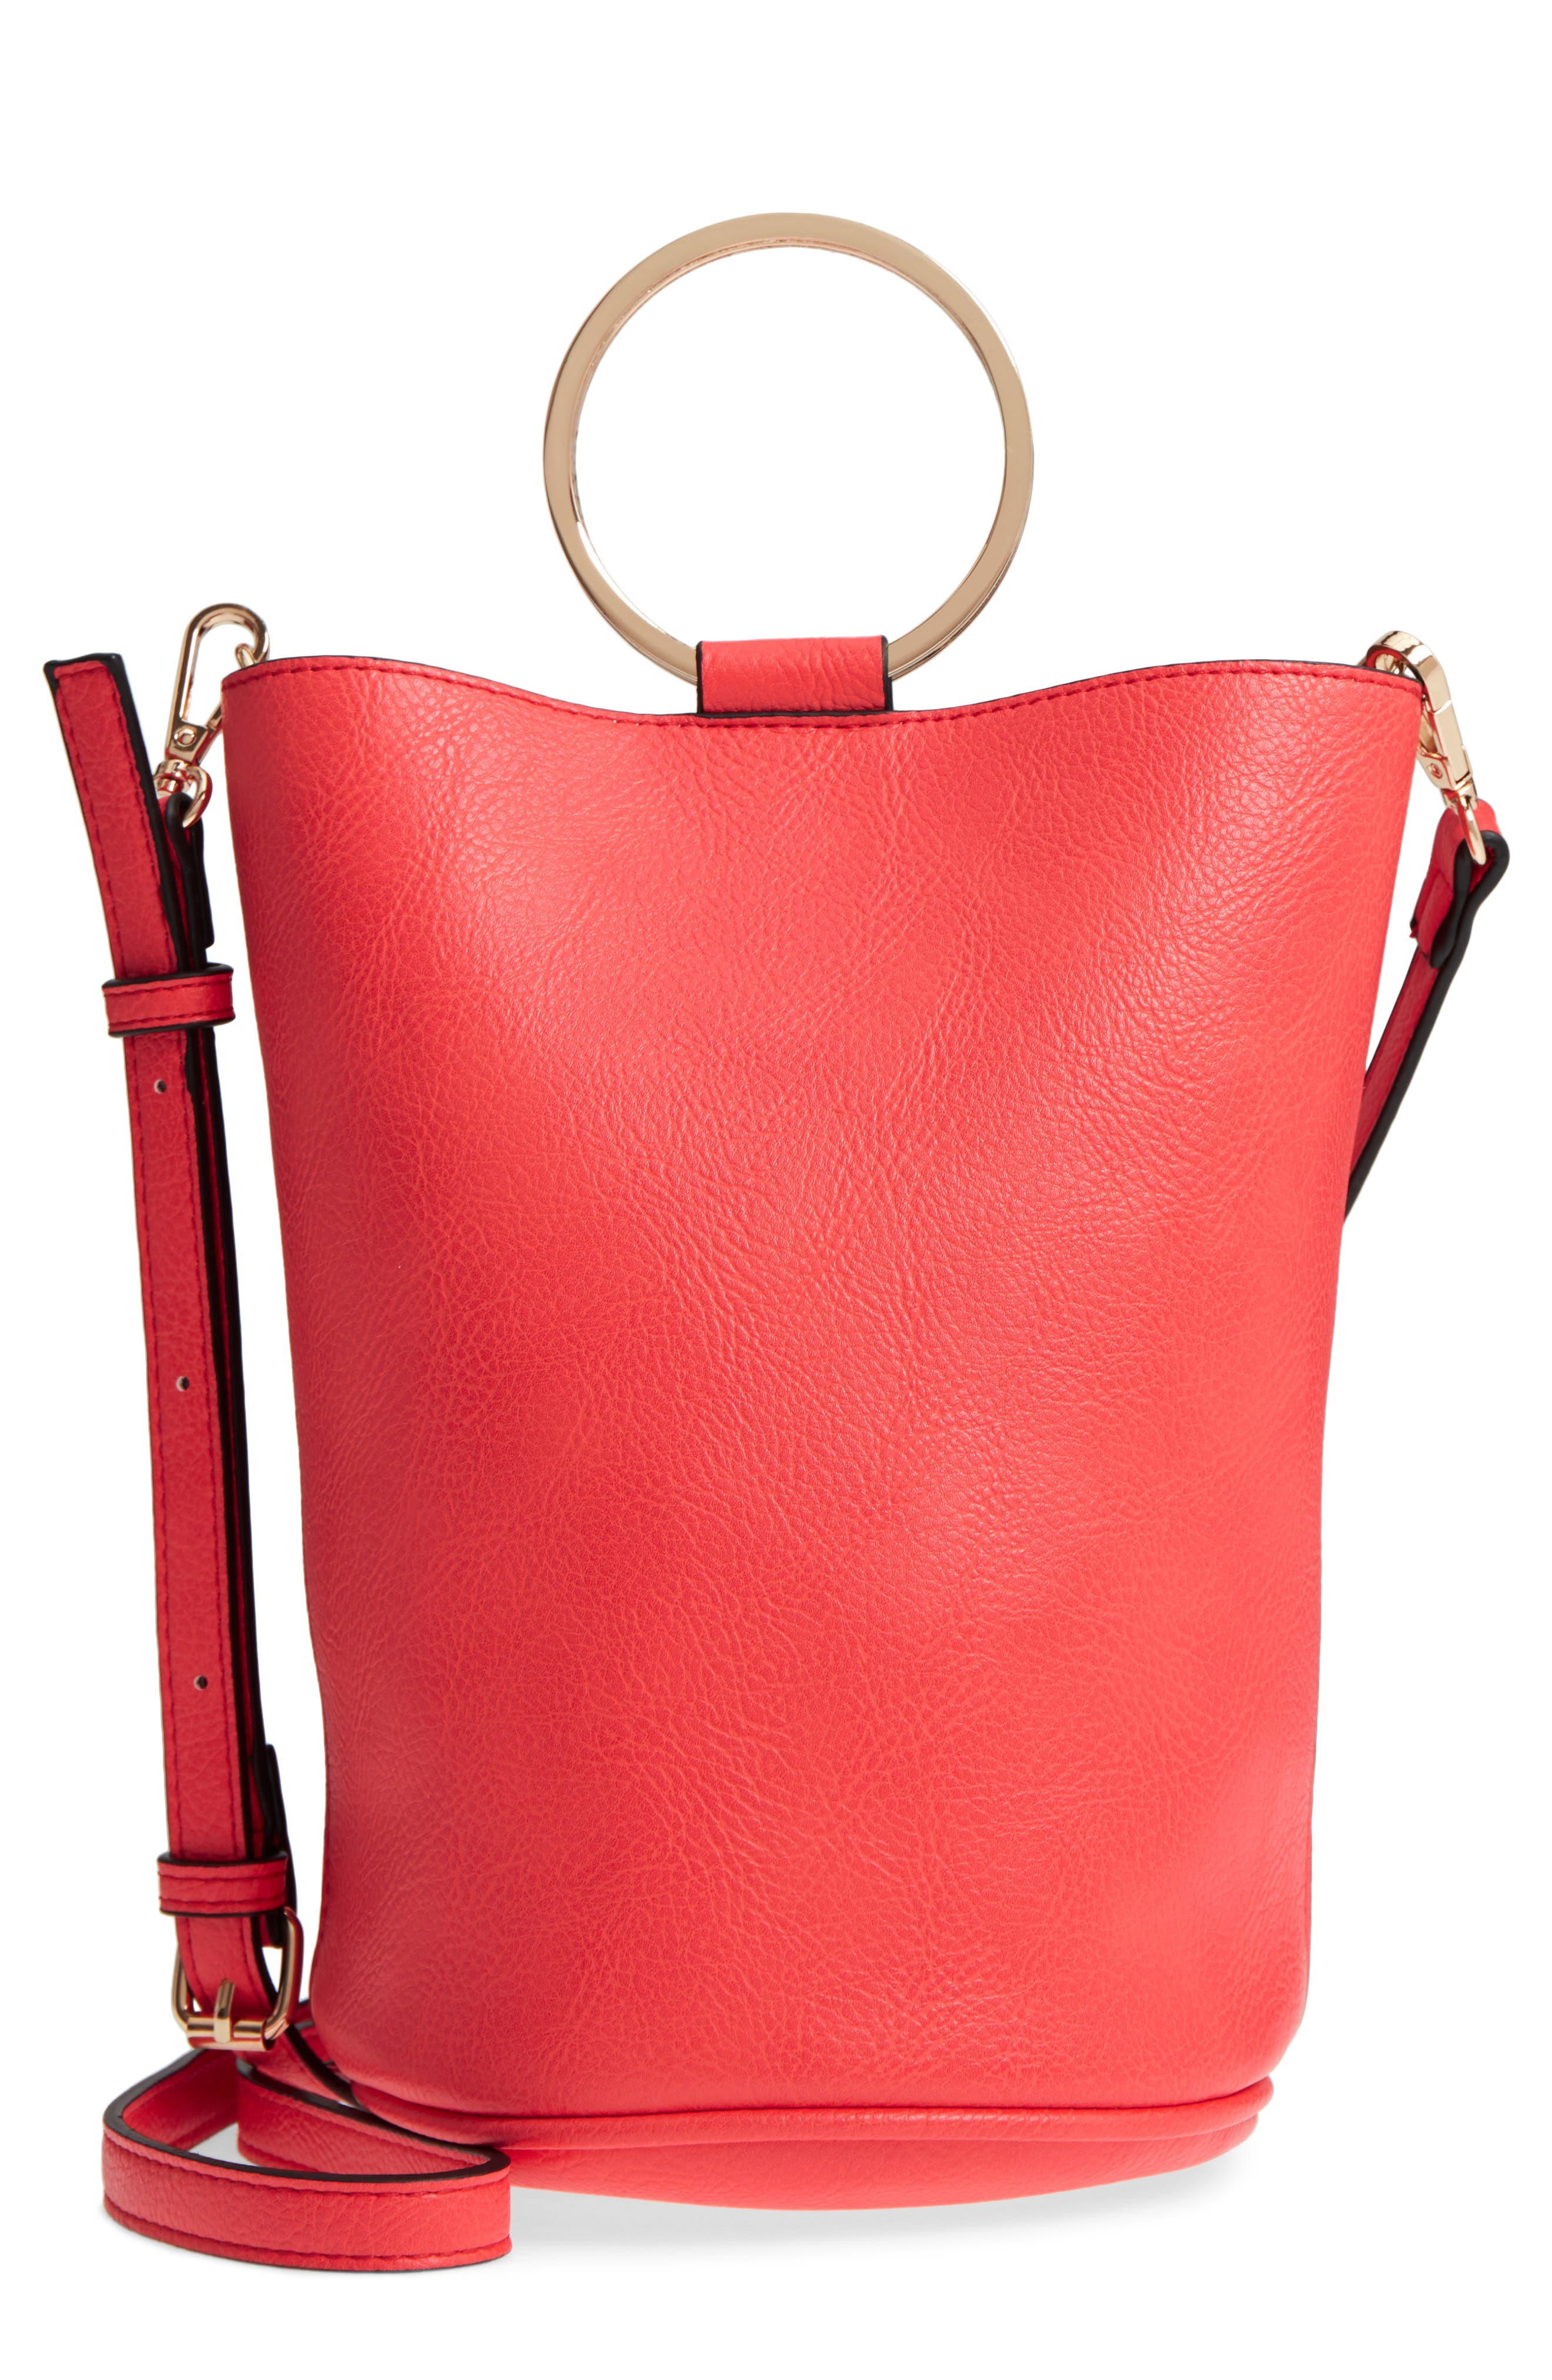 Mali + Lili Ilia Vegan Leather Ring Handle Bucket Bag,                             Main thumbnail 3, color,